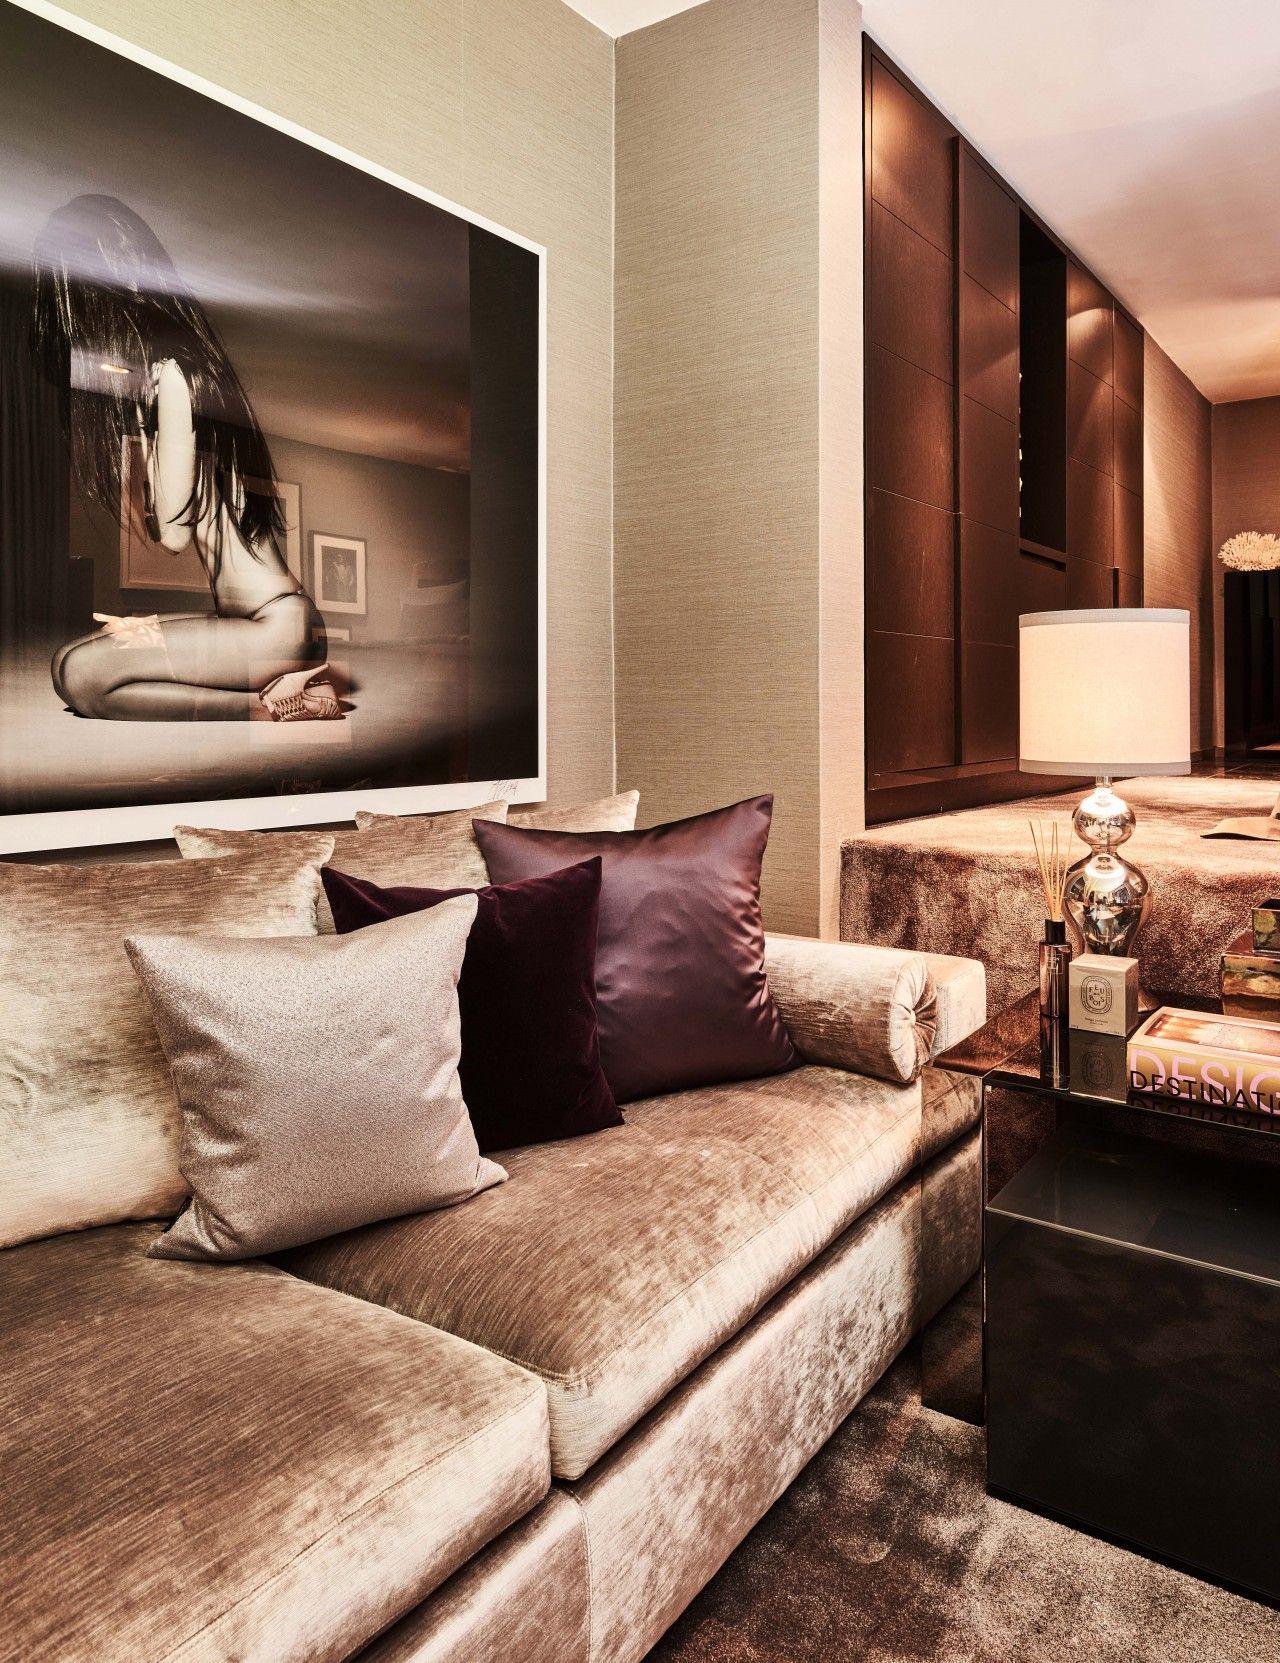 Marvelous The Netherlands / Huizen / Head Quarter / Show Room / Guest Bed Room /  Avalon